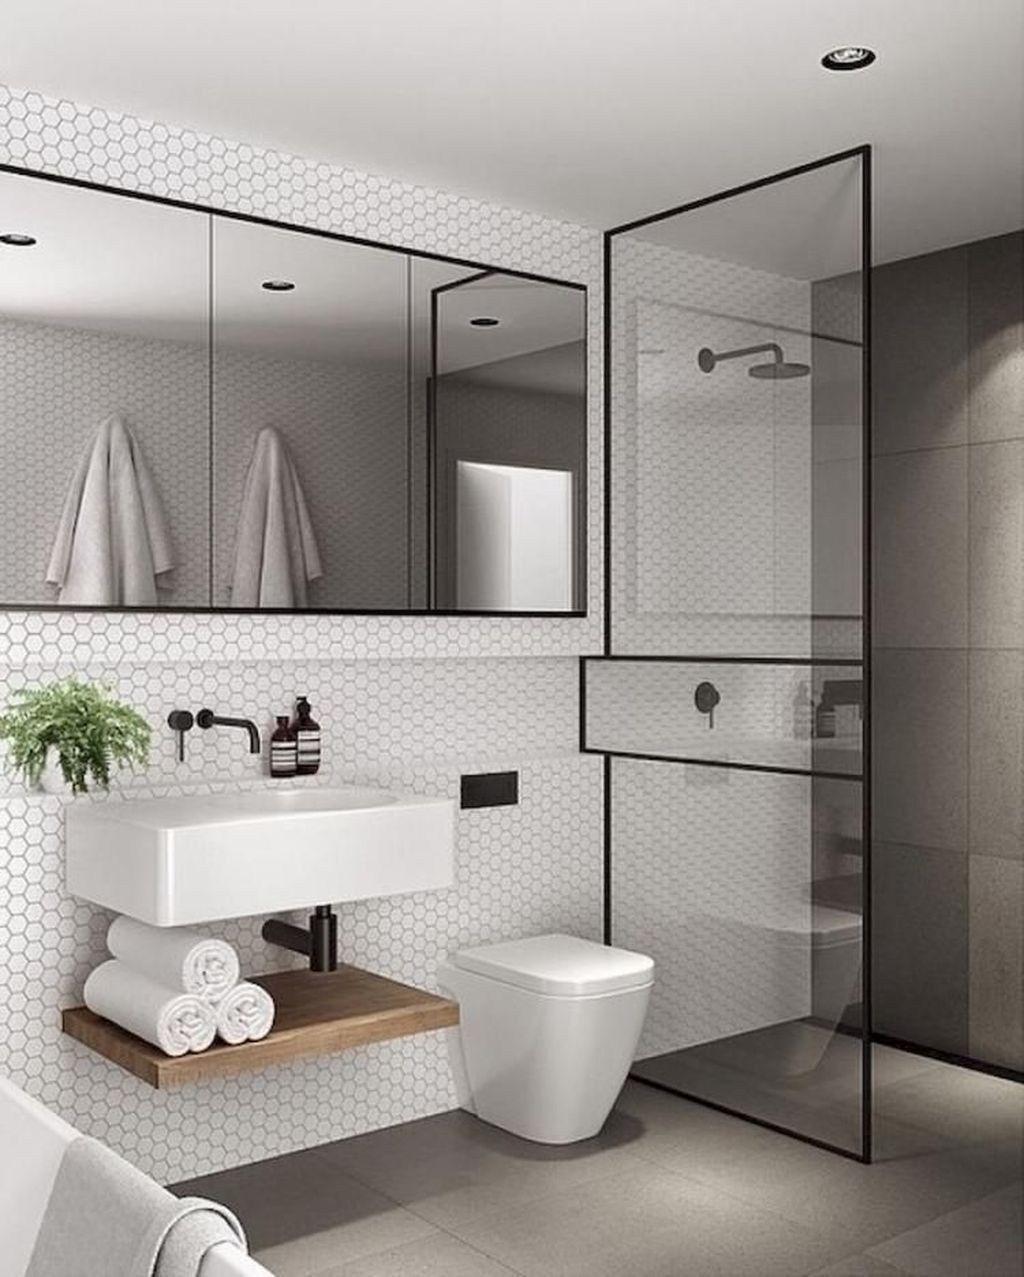 Best Small Master Bathroom Remodel Ideas 26 Bathroom Design Small Modern Modern Small Bathrooms Modern Bathroom Design